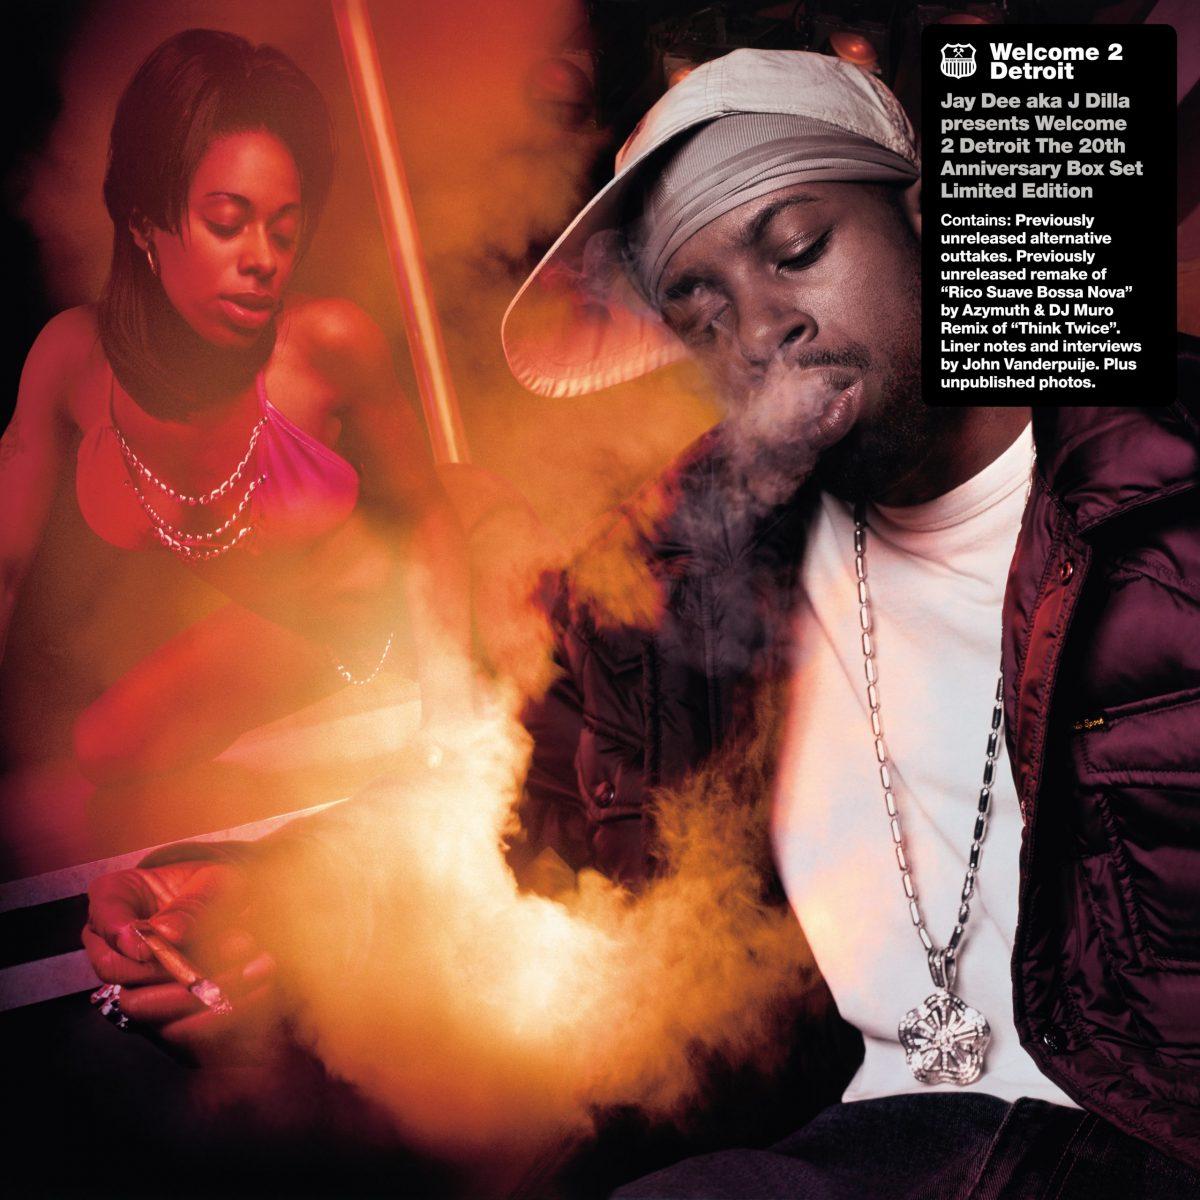 j dilla welcome 2 detroit 20th nniversary vinyl box set 7-inch cover art